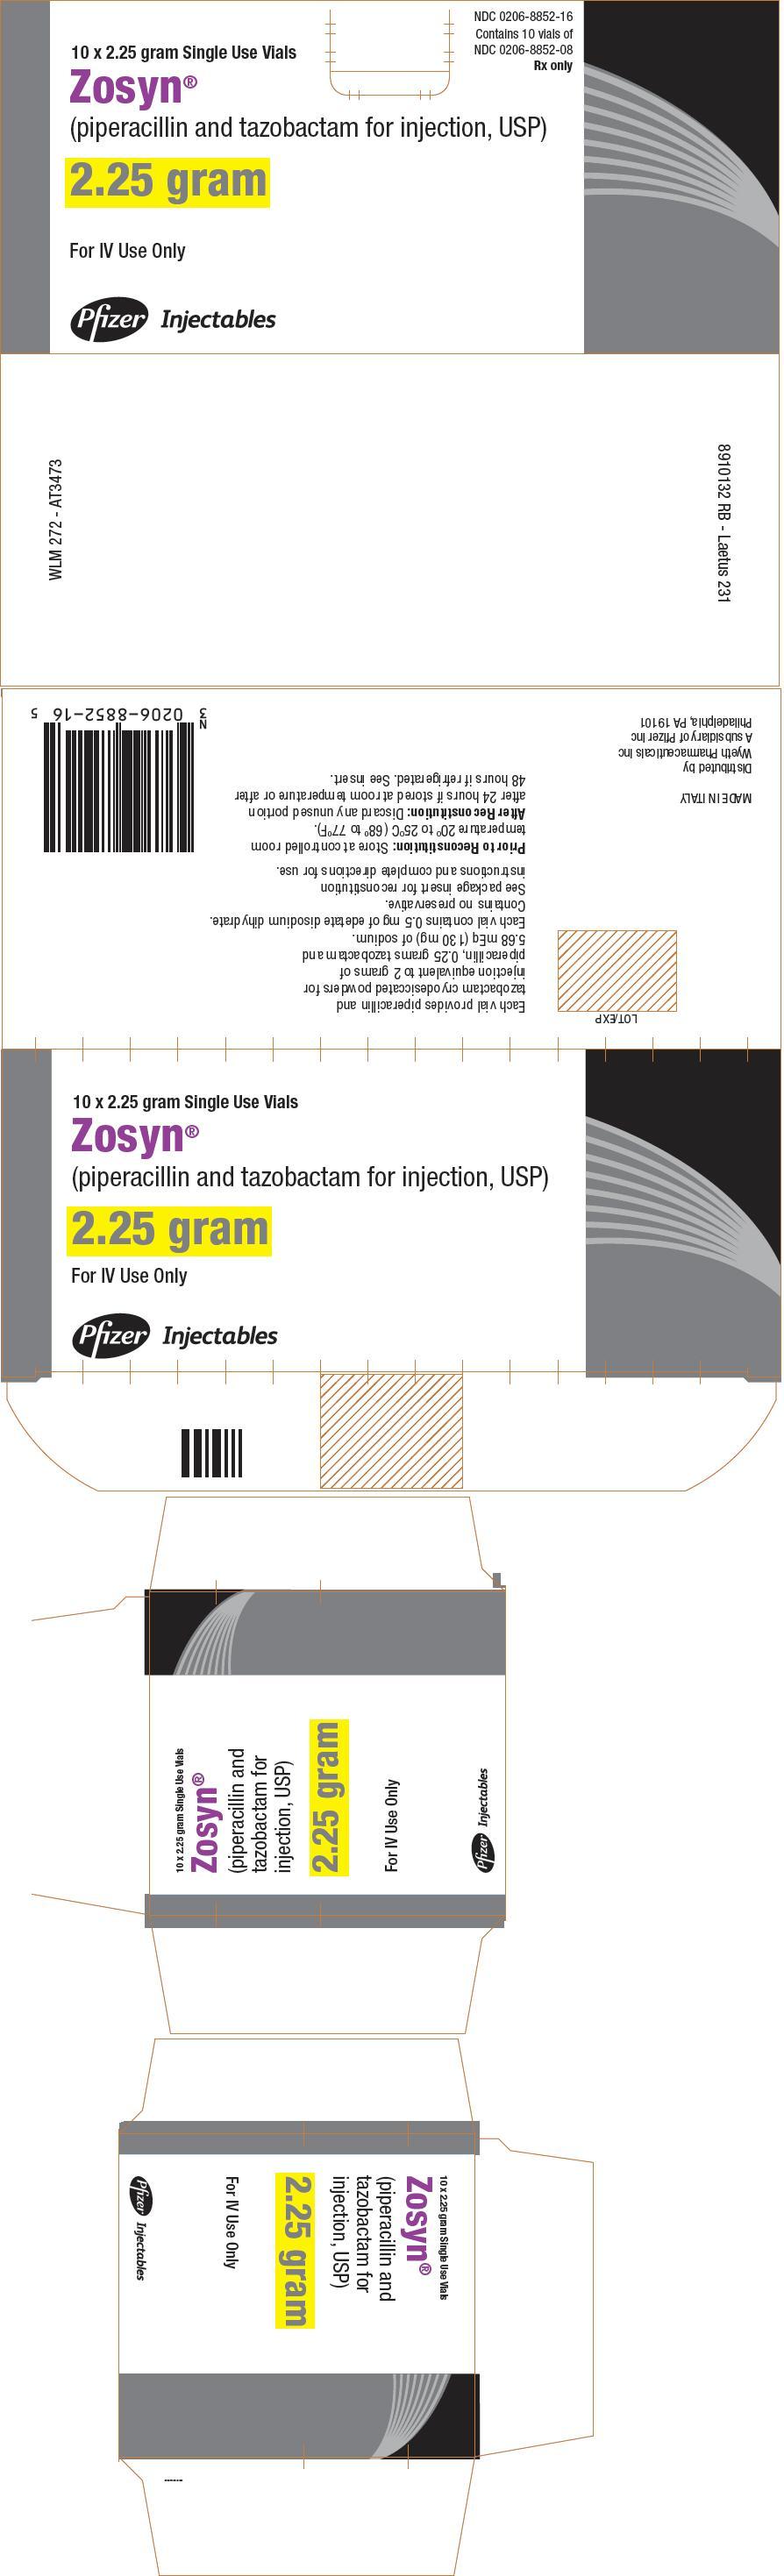 PRINCIPAL DISPLAY PANEL - 2.25 gram Vial Carton